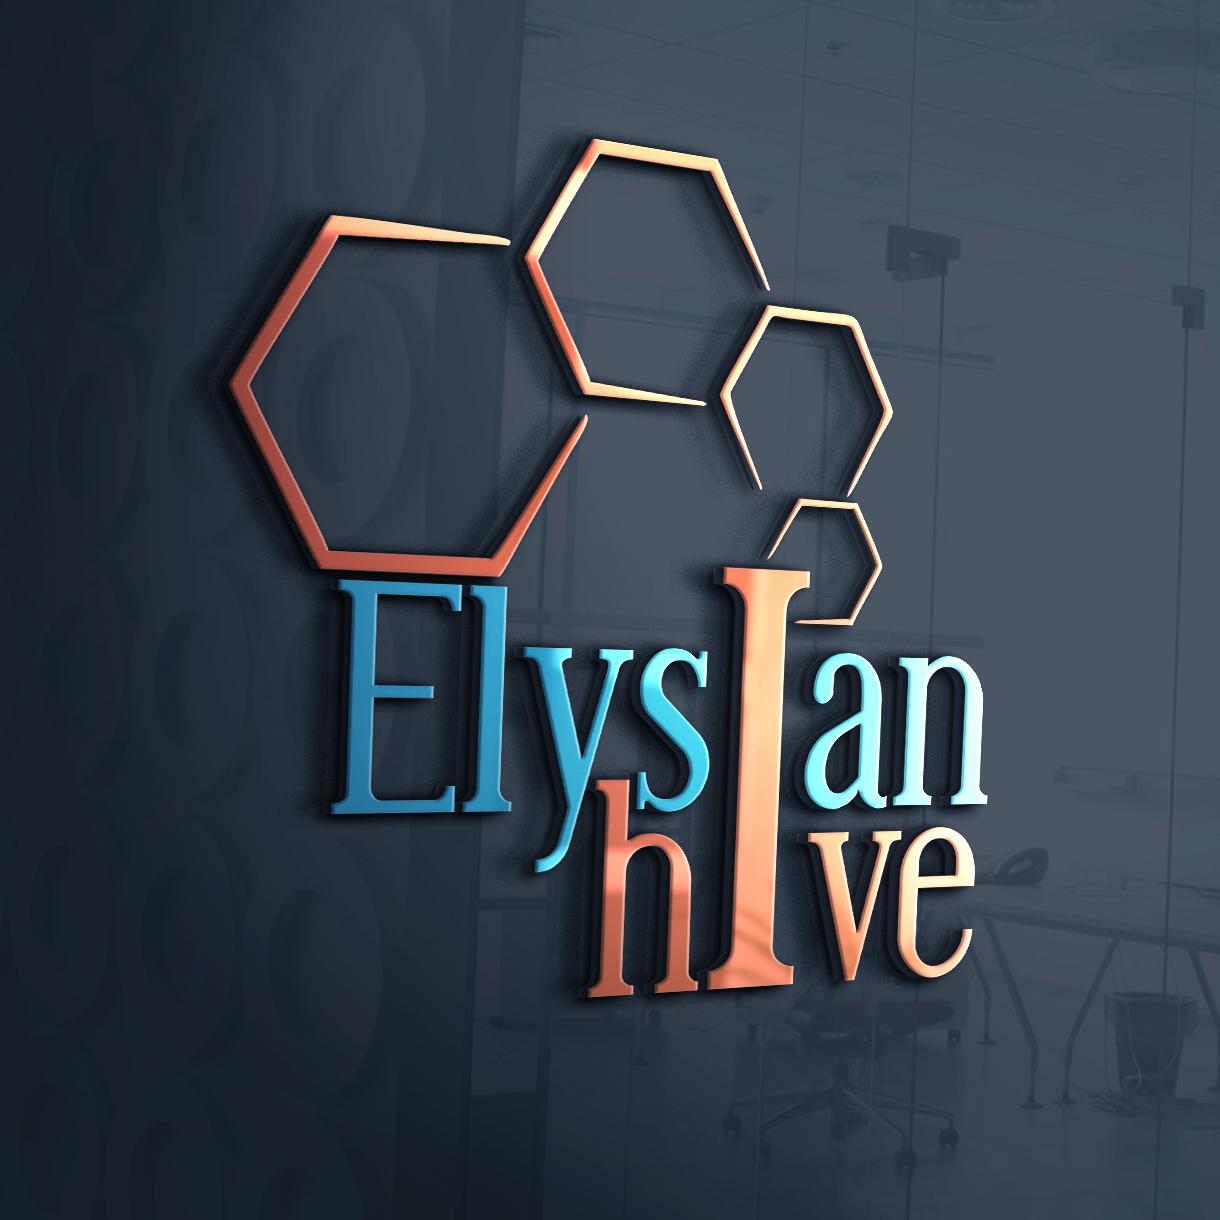 Elysian Hive